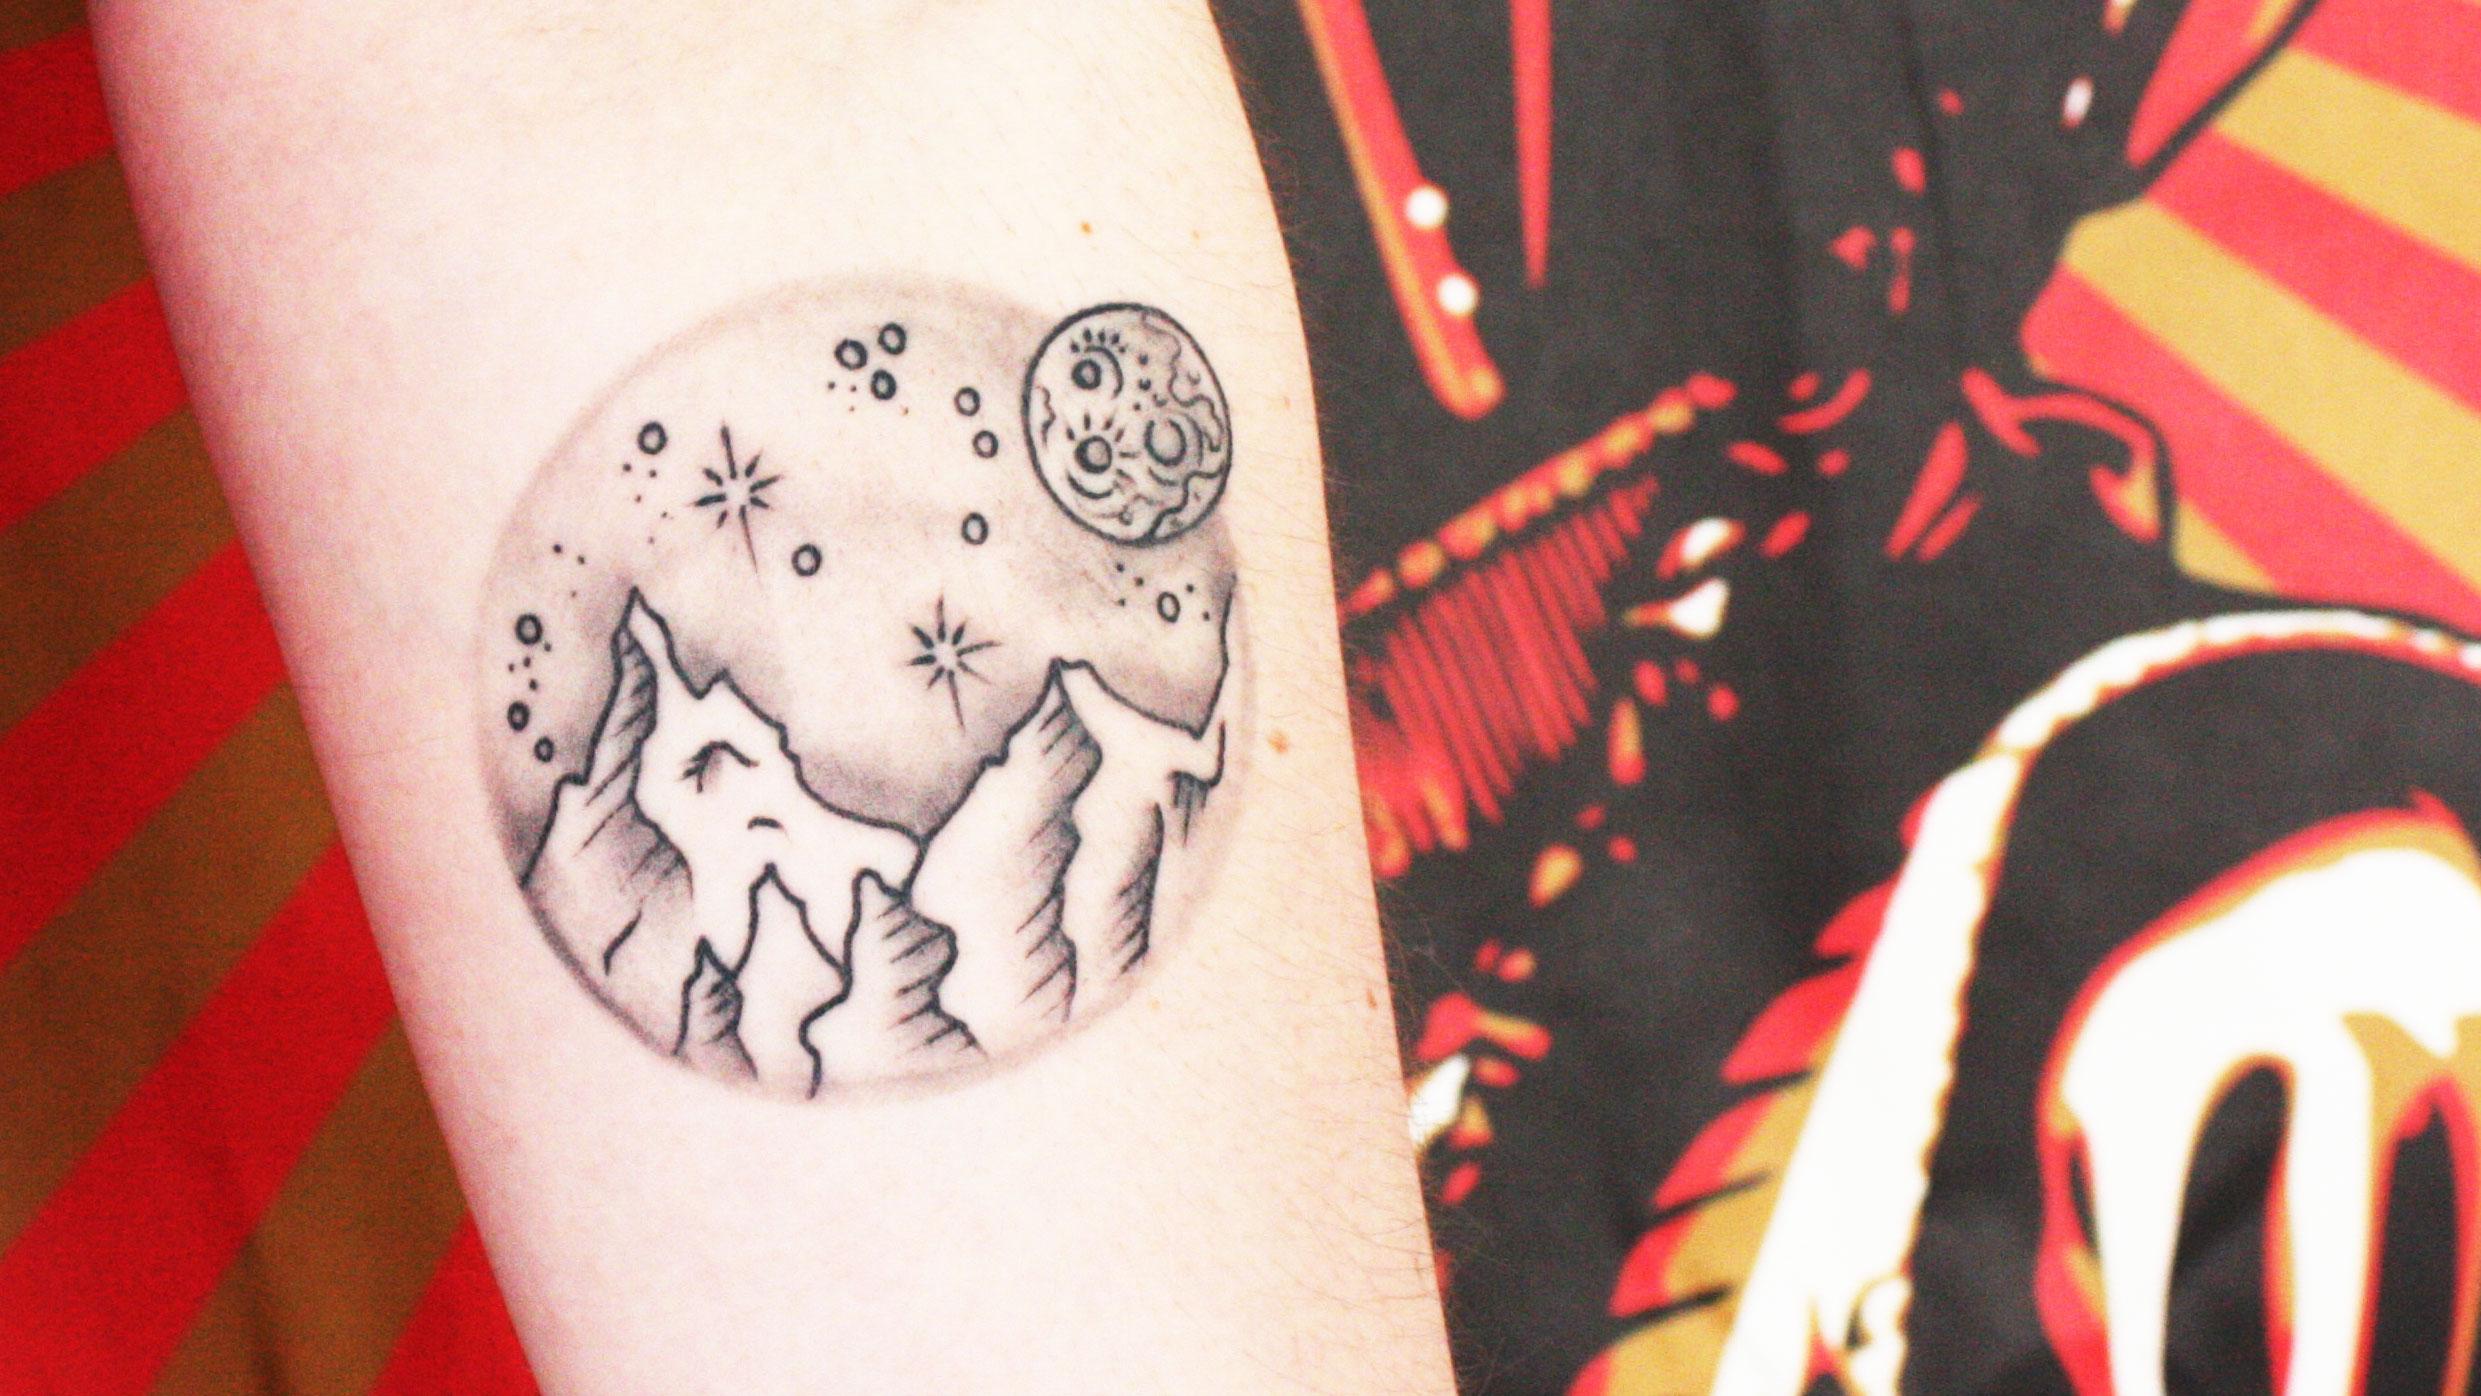 Tattoo_Photo_1.jpg